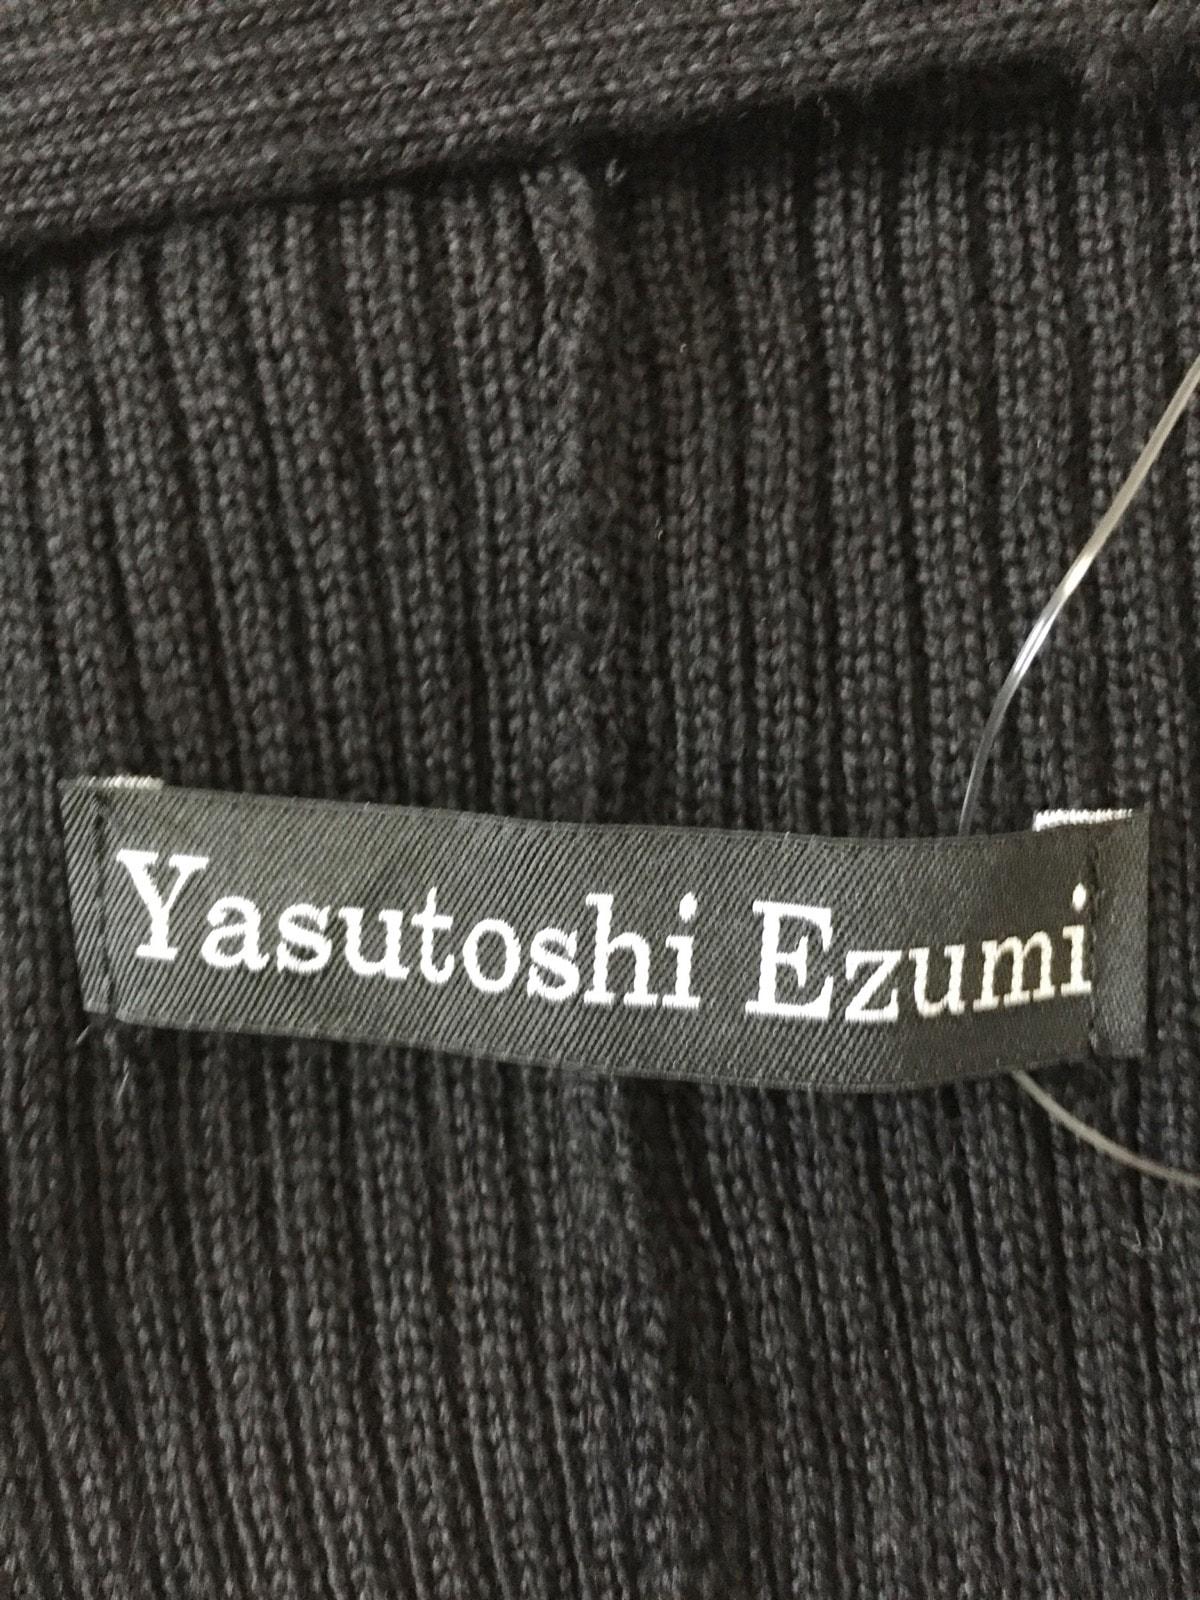 Yasutoshi Ezumi(ヤストシ エズミ)のベスト